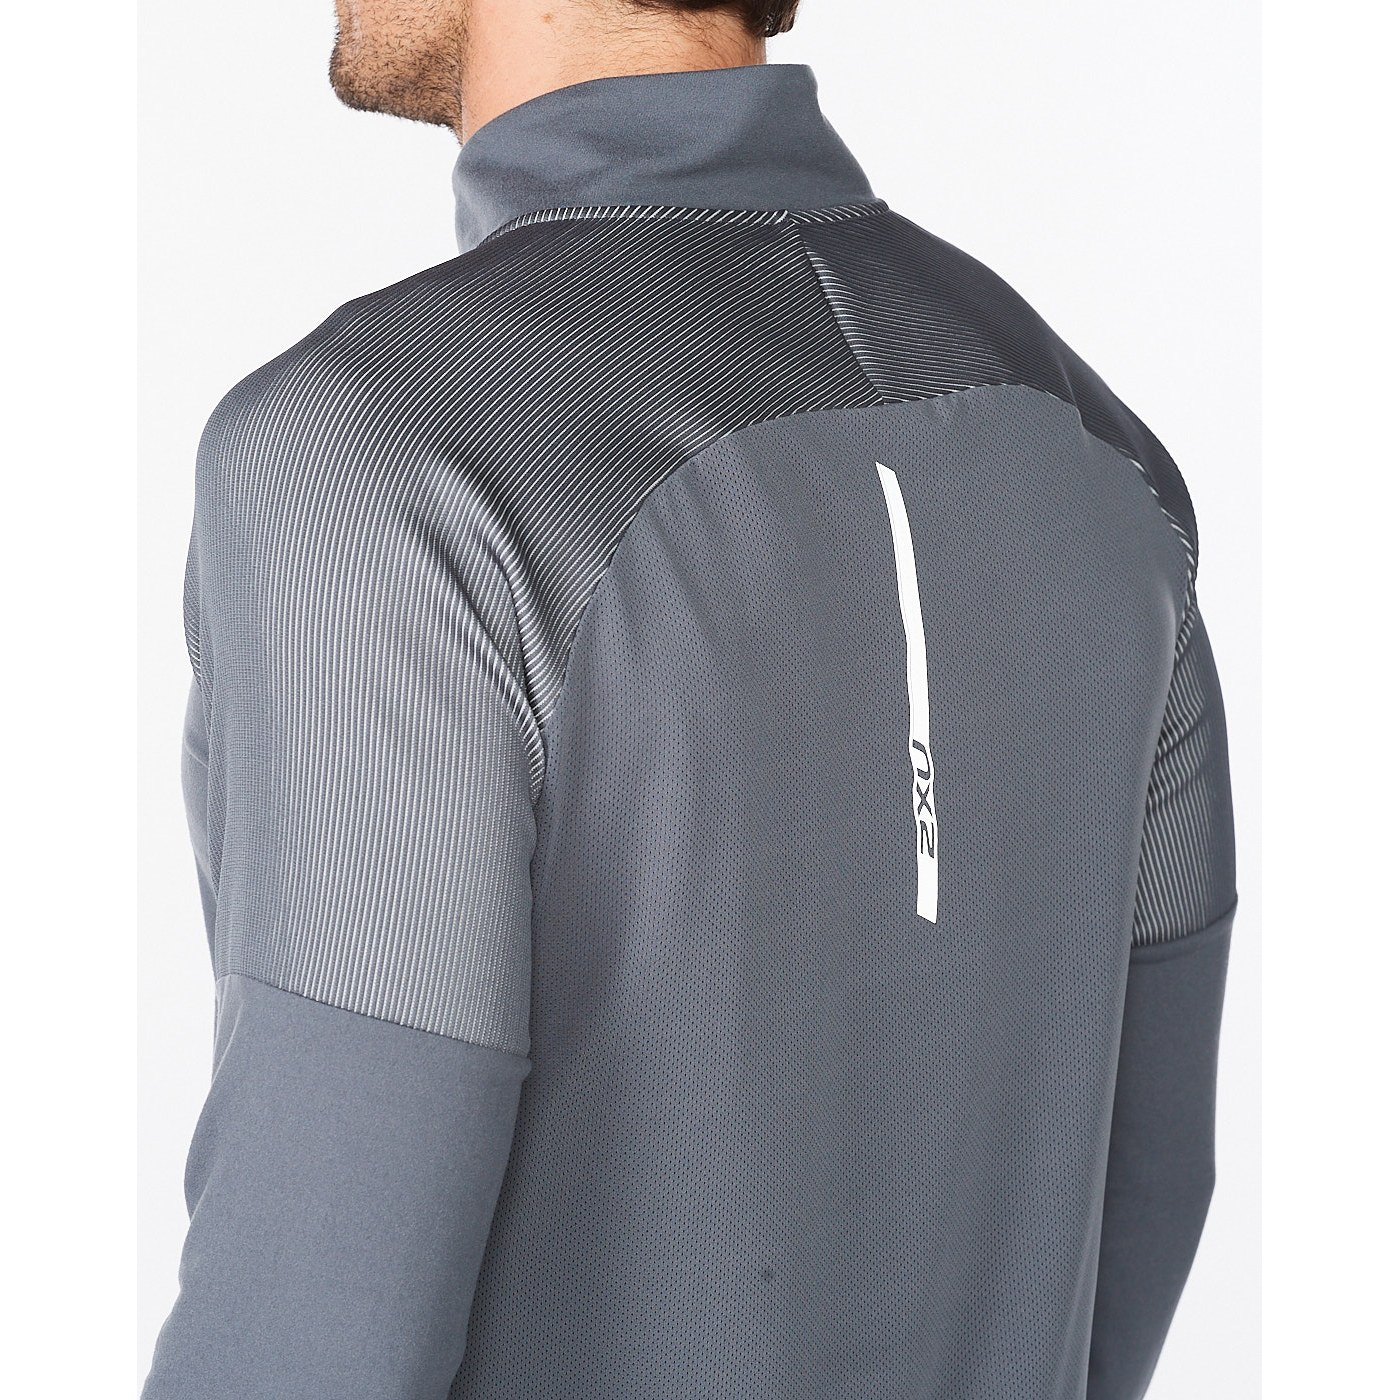 Imagen de 2XU Light Speed 1/2 Zip Camiseta de manga larga - turbulence/silver reflective